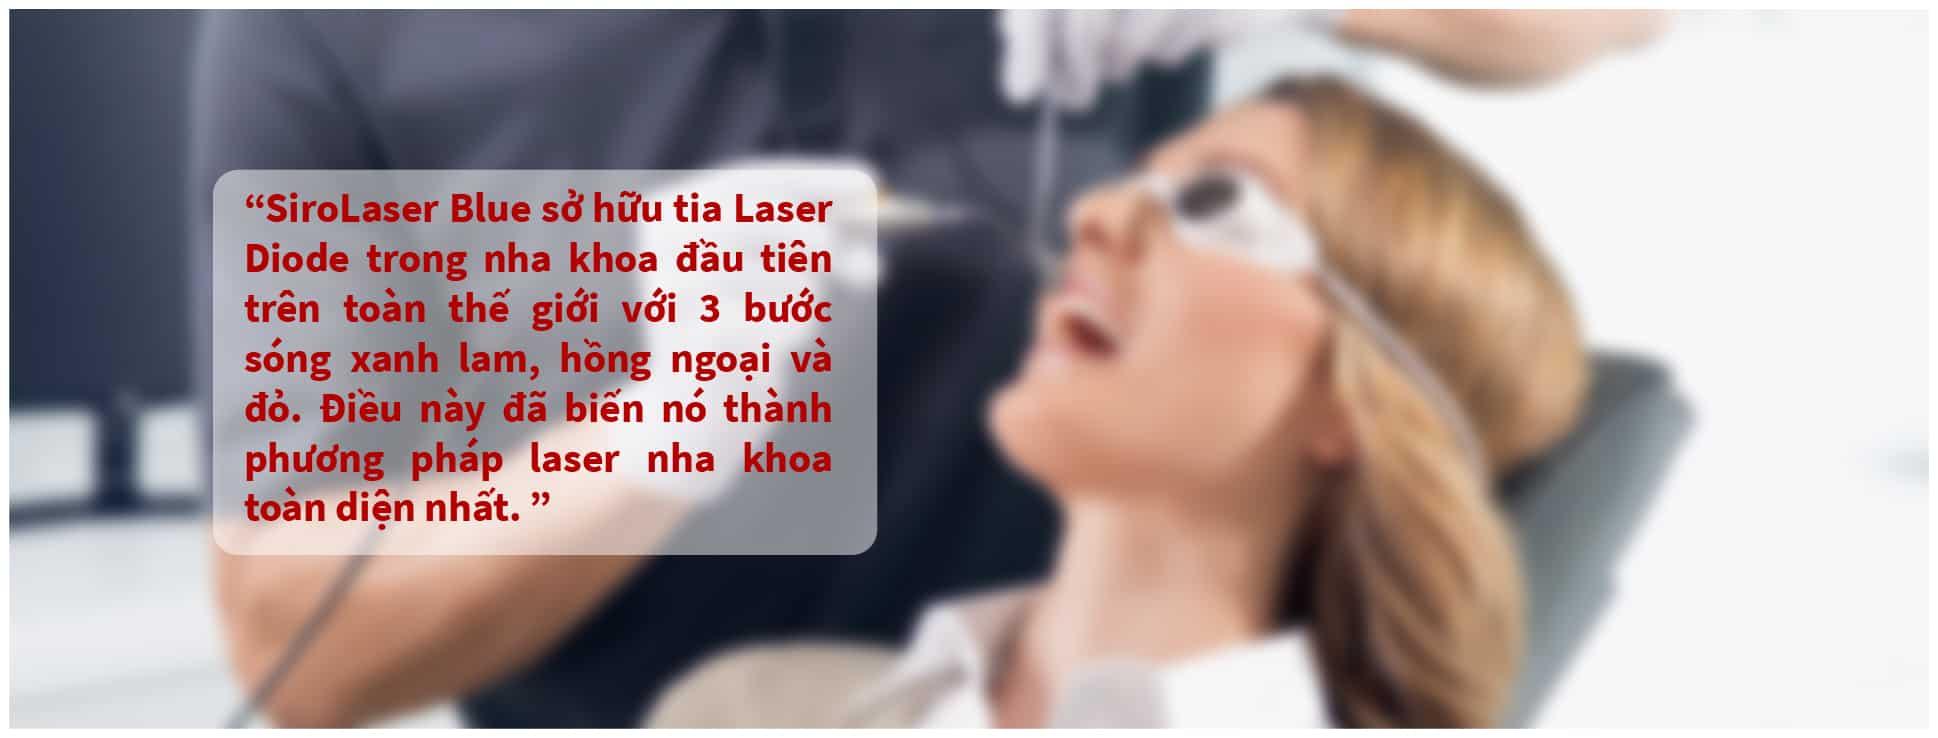 Máy Laser nha khoa SiroLaser Blue